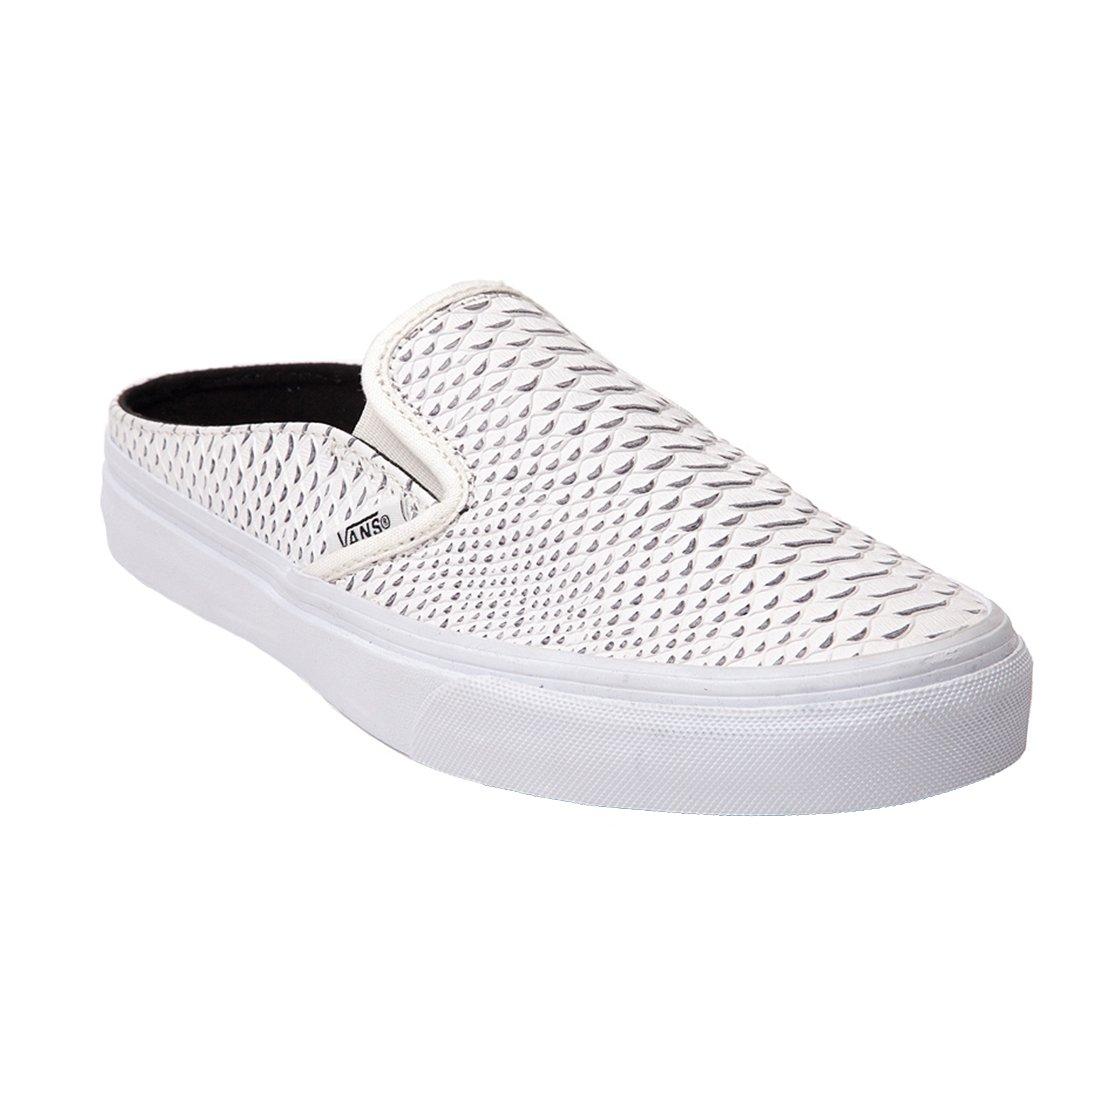 68b304c2465 Vans Womens Classic Slip On Mule Low Top Slip On Fashion Sneakers ...